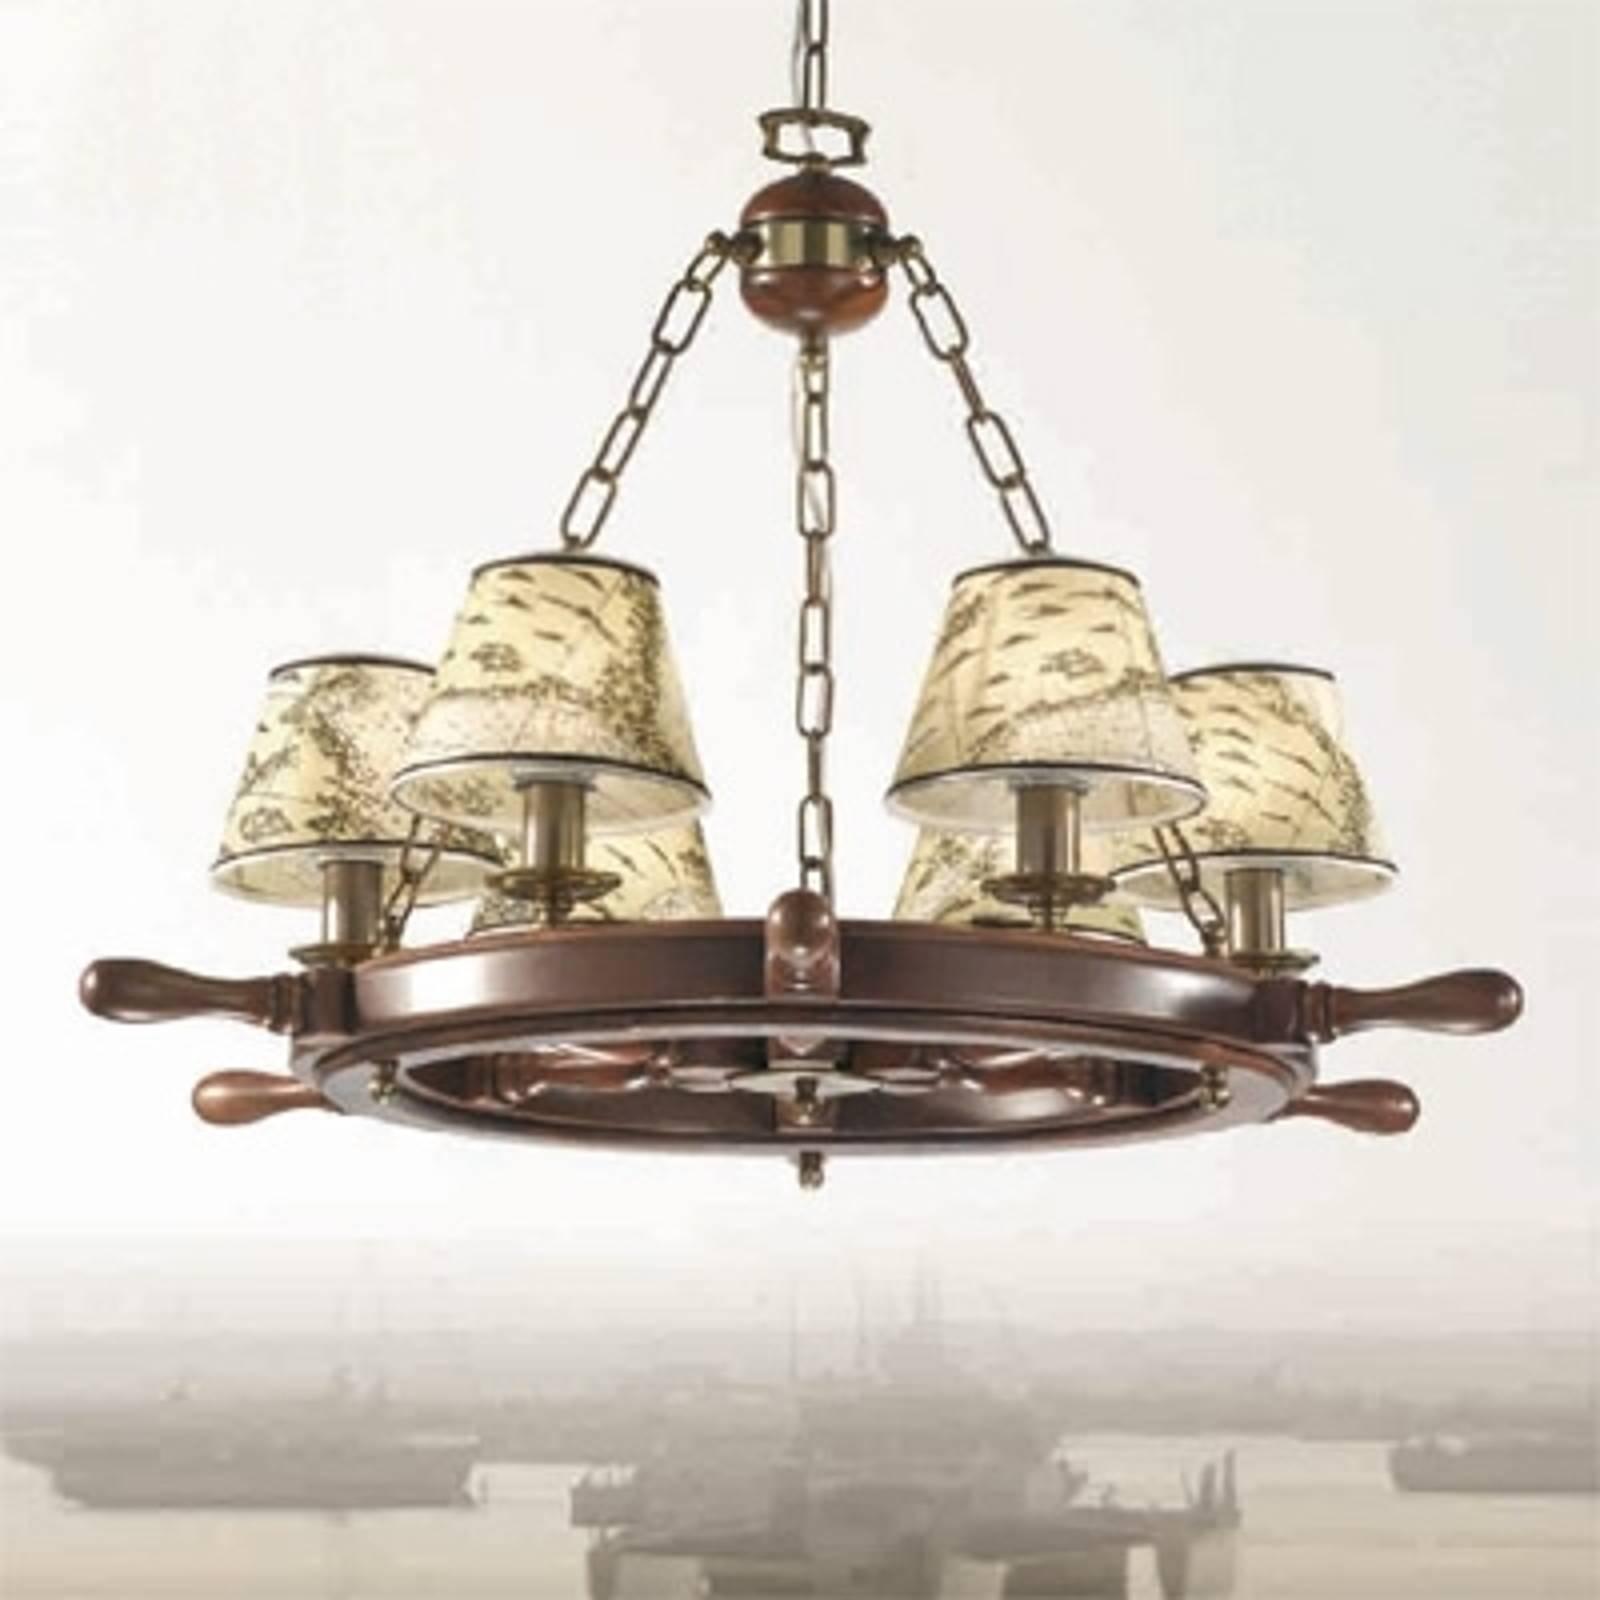 Indrukwekkende kroonluchter Porto 6-lichts